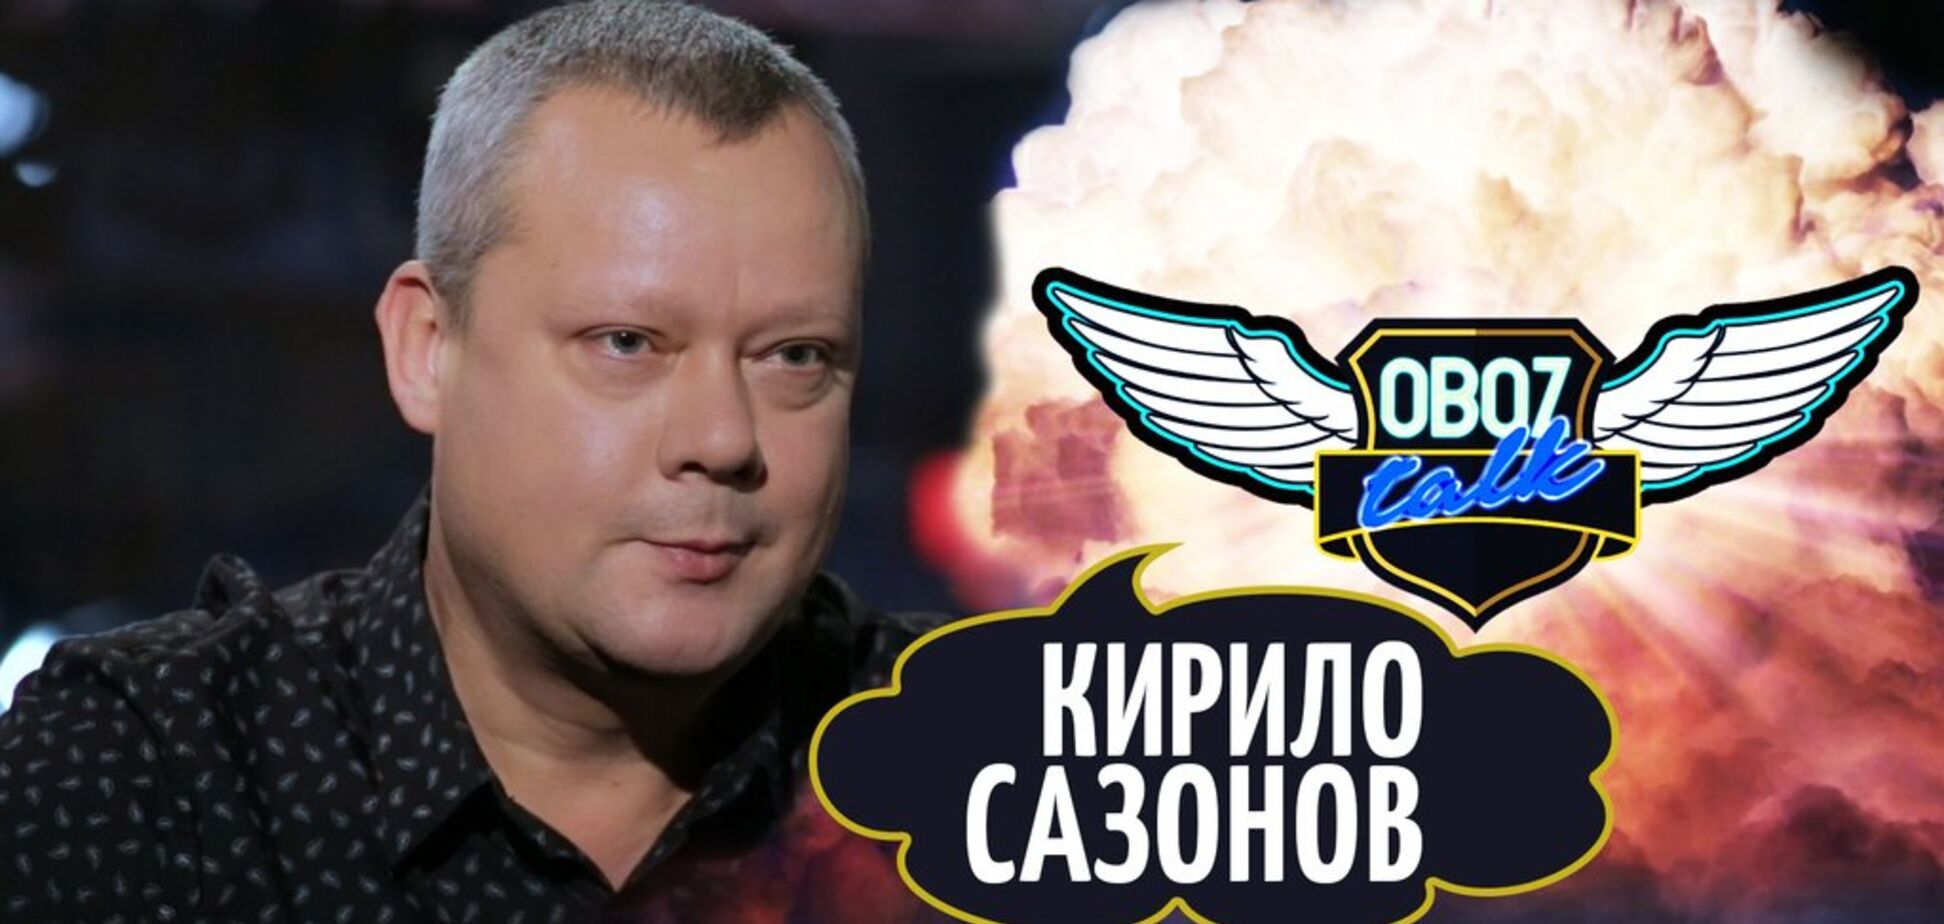 OBOZ TALK - гость Кирилл Сазонов